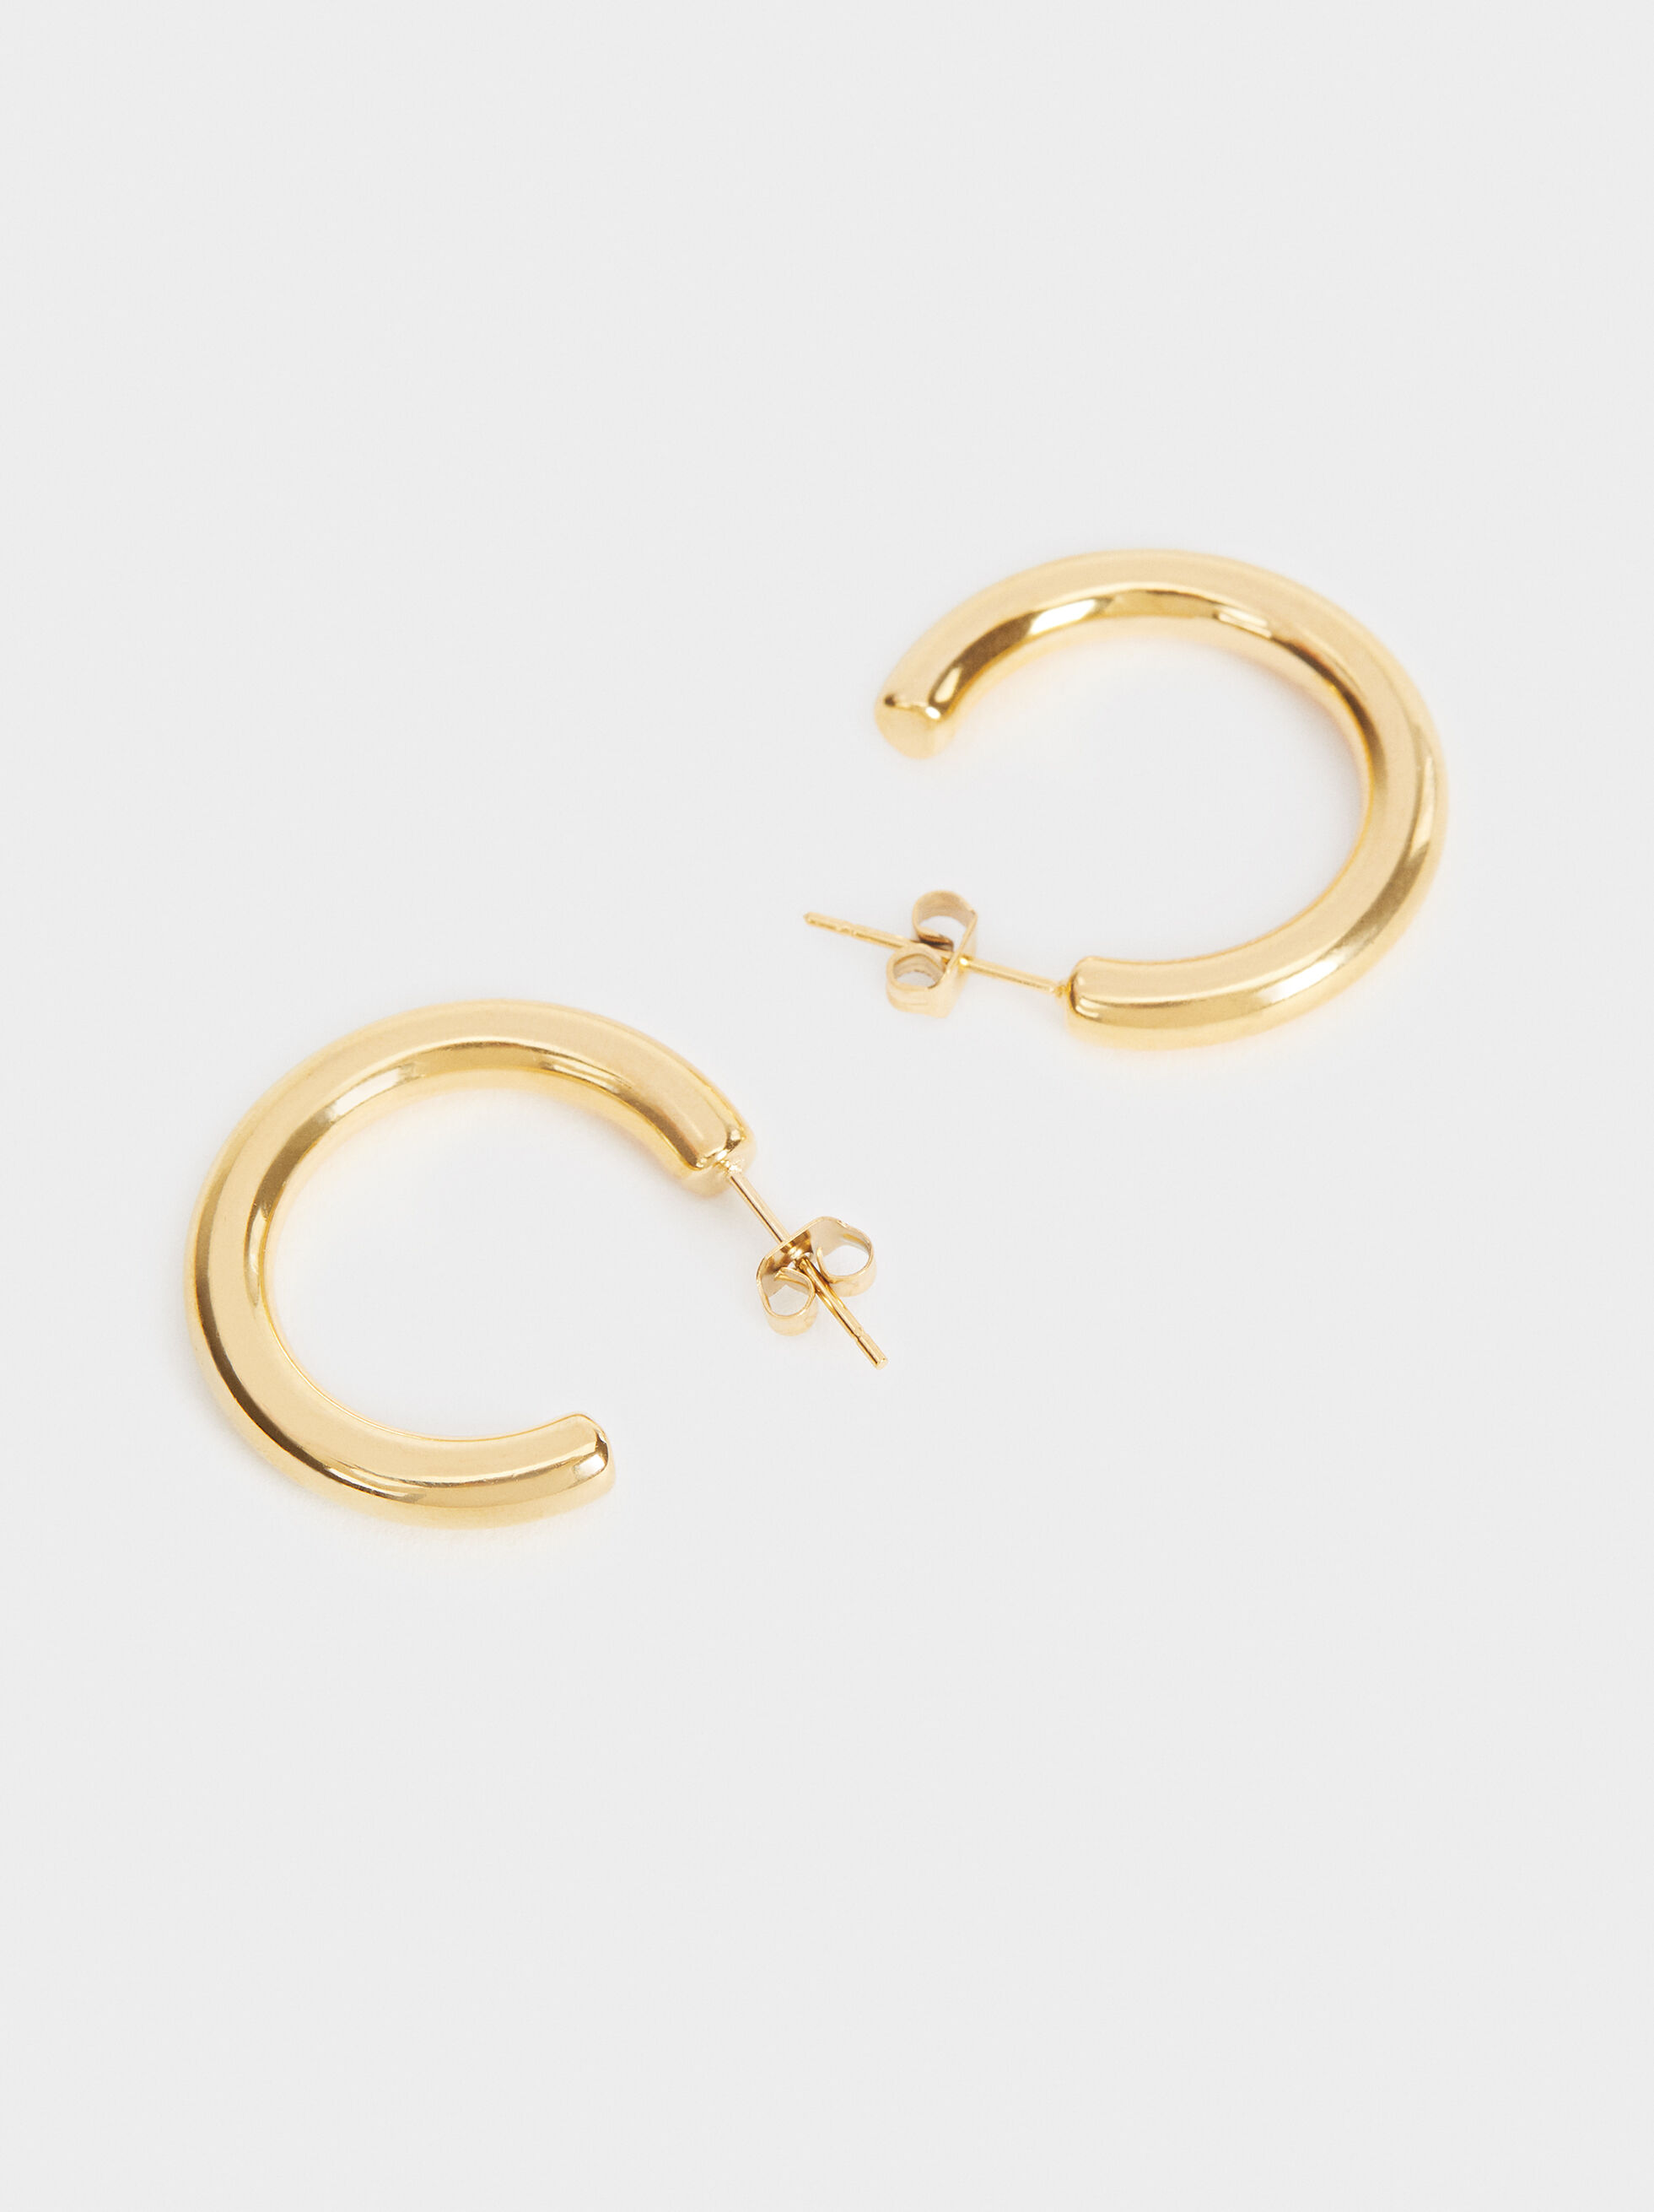 Small Steel Hoop Earrings, Golden, hi-res